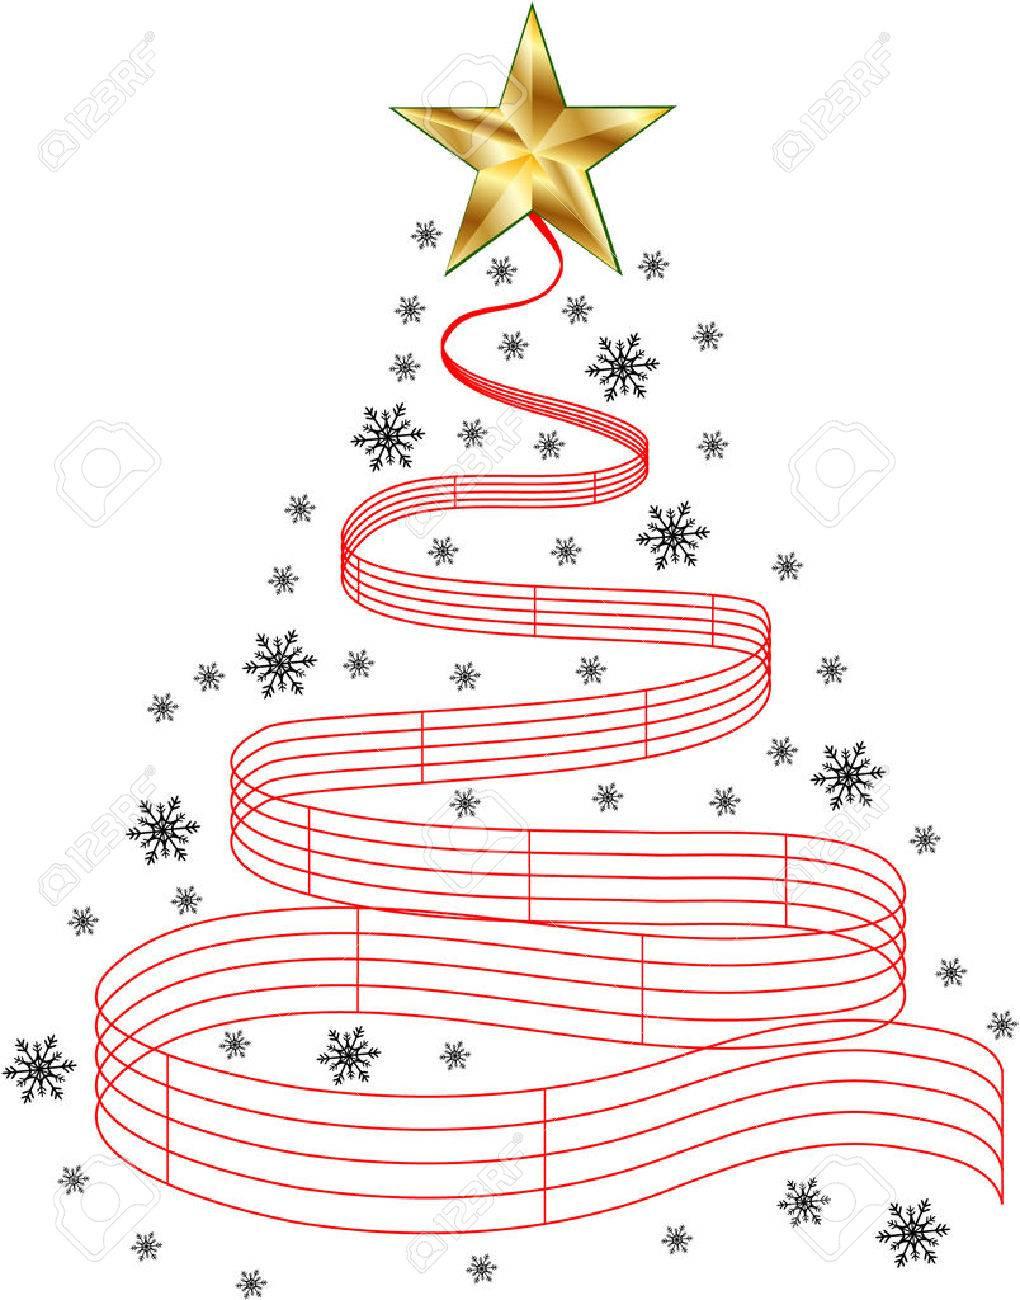 Christmas Carols Clipart.Christmas Tree Music